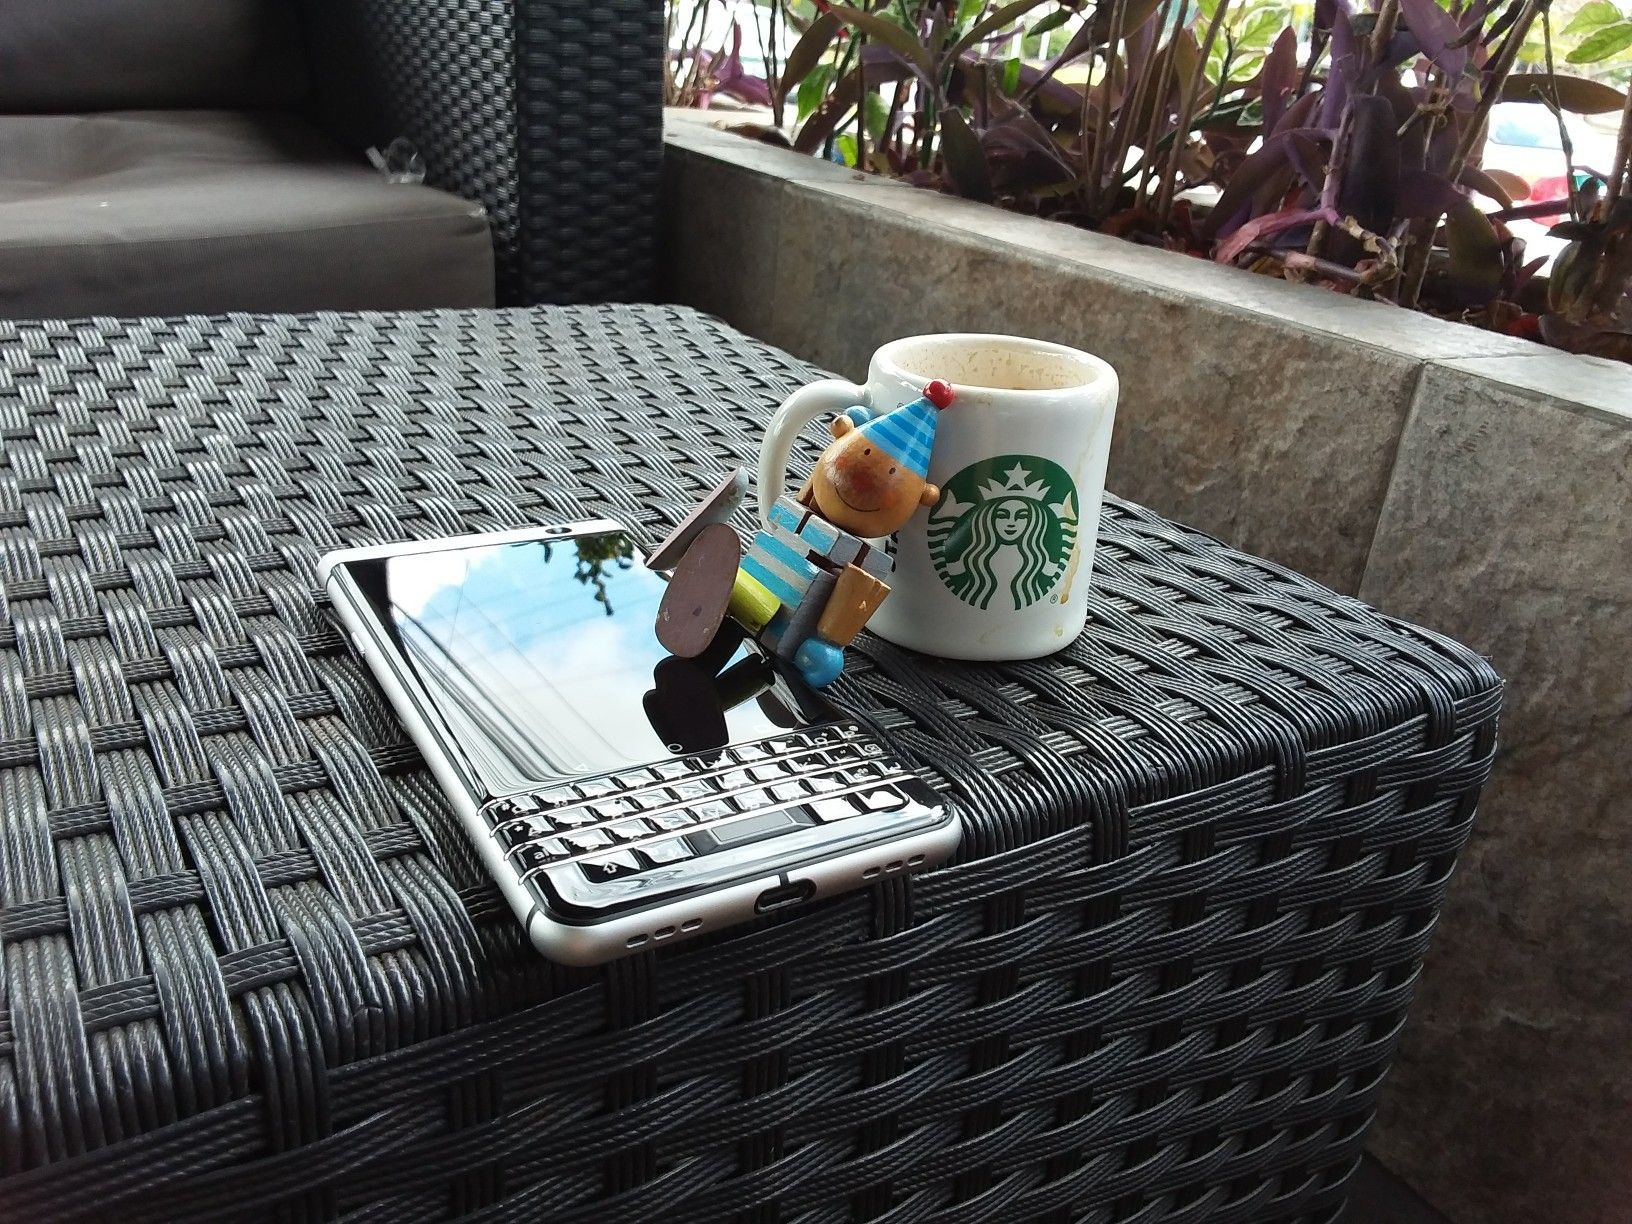 #AgaveLoco #Cancun #coffee #Starbucks #coffeetime #breakfast #AgaveSyrup